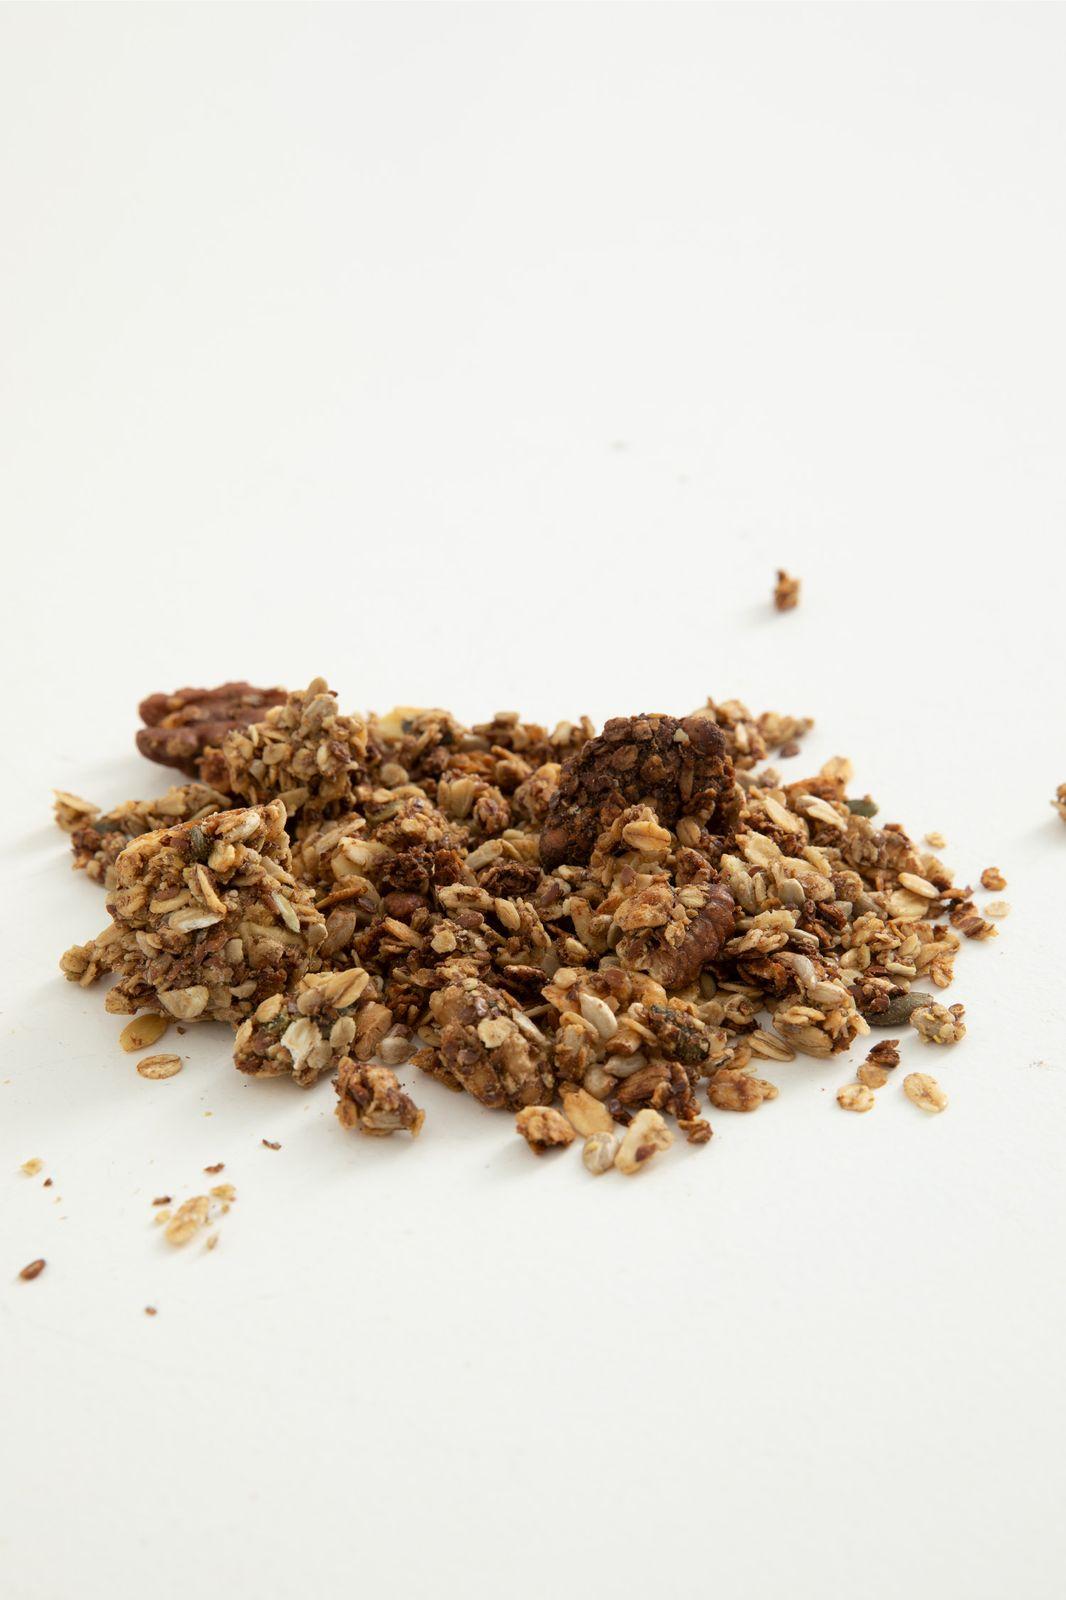 Camile's granola 35% zaden en noten - Homeland | Sissy-Boy